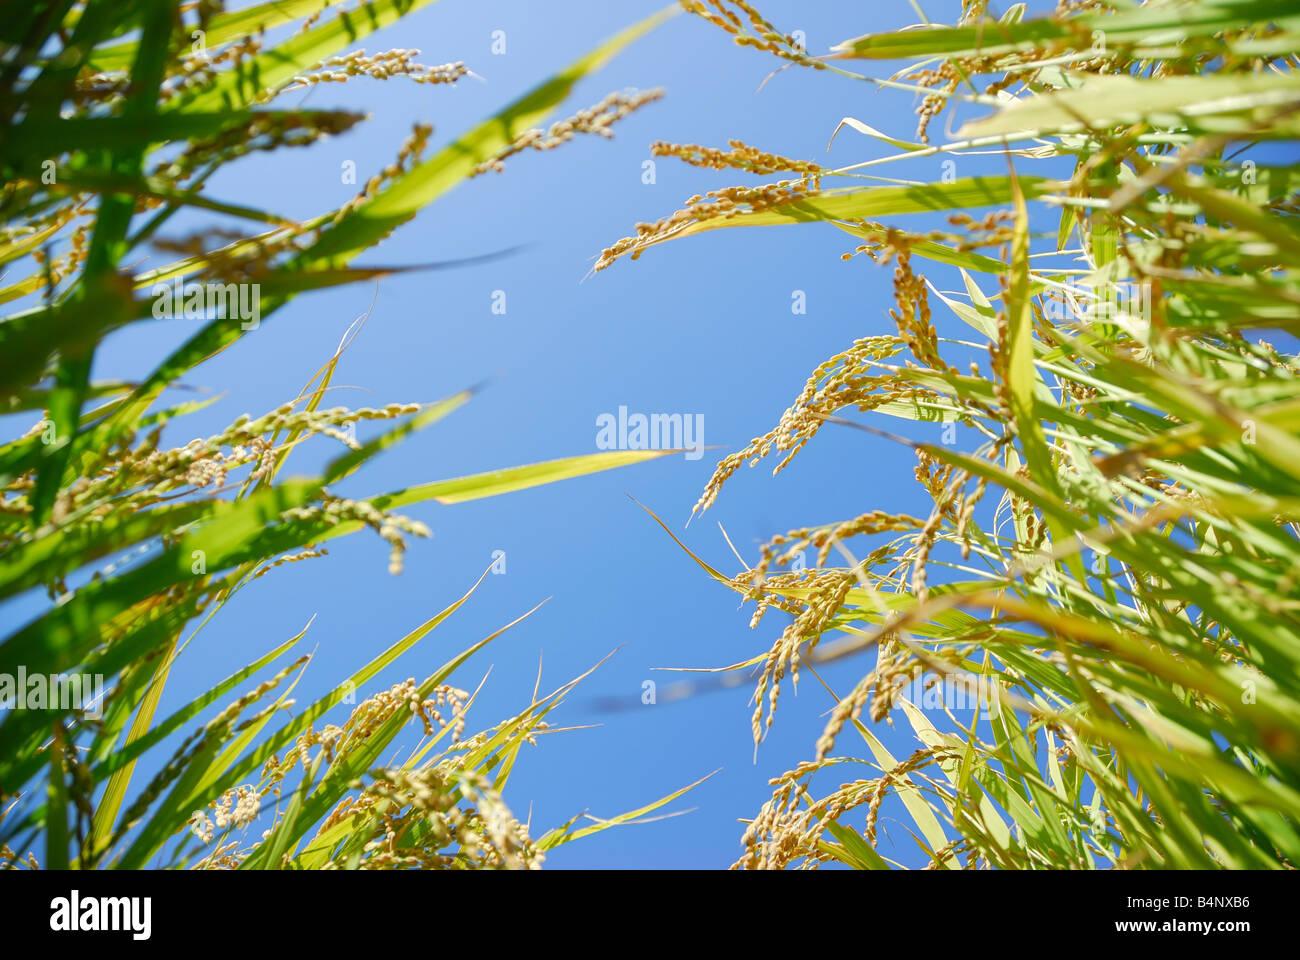 rice plants - Stock Image